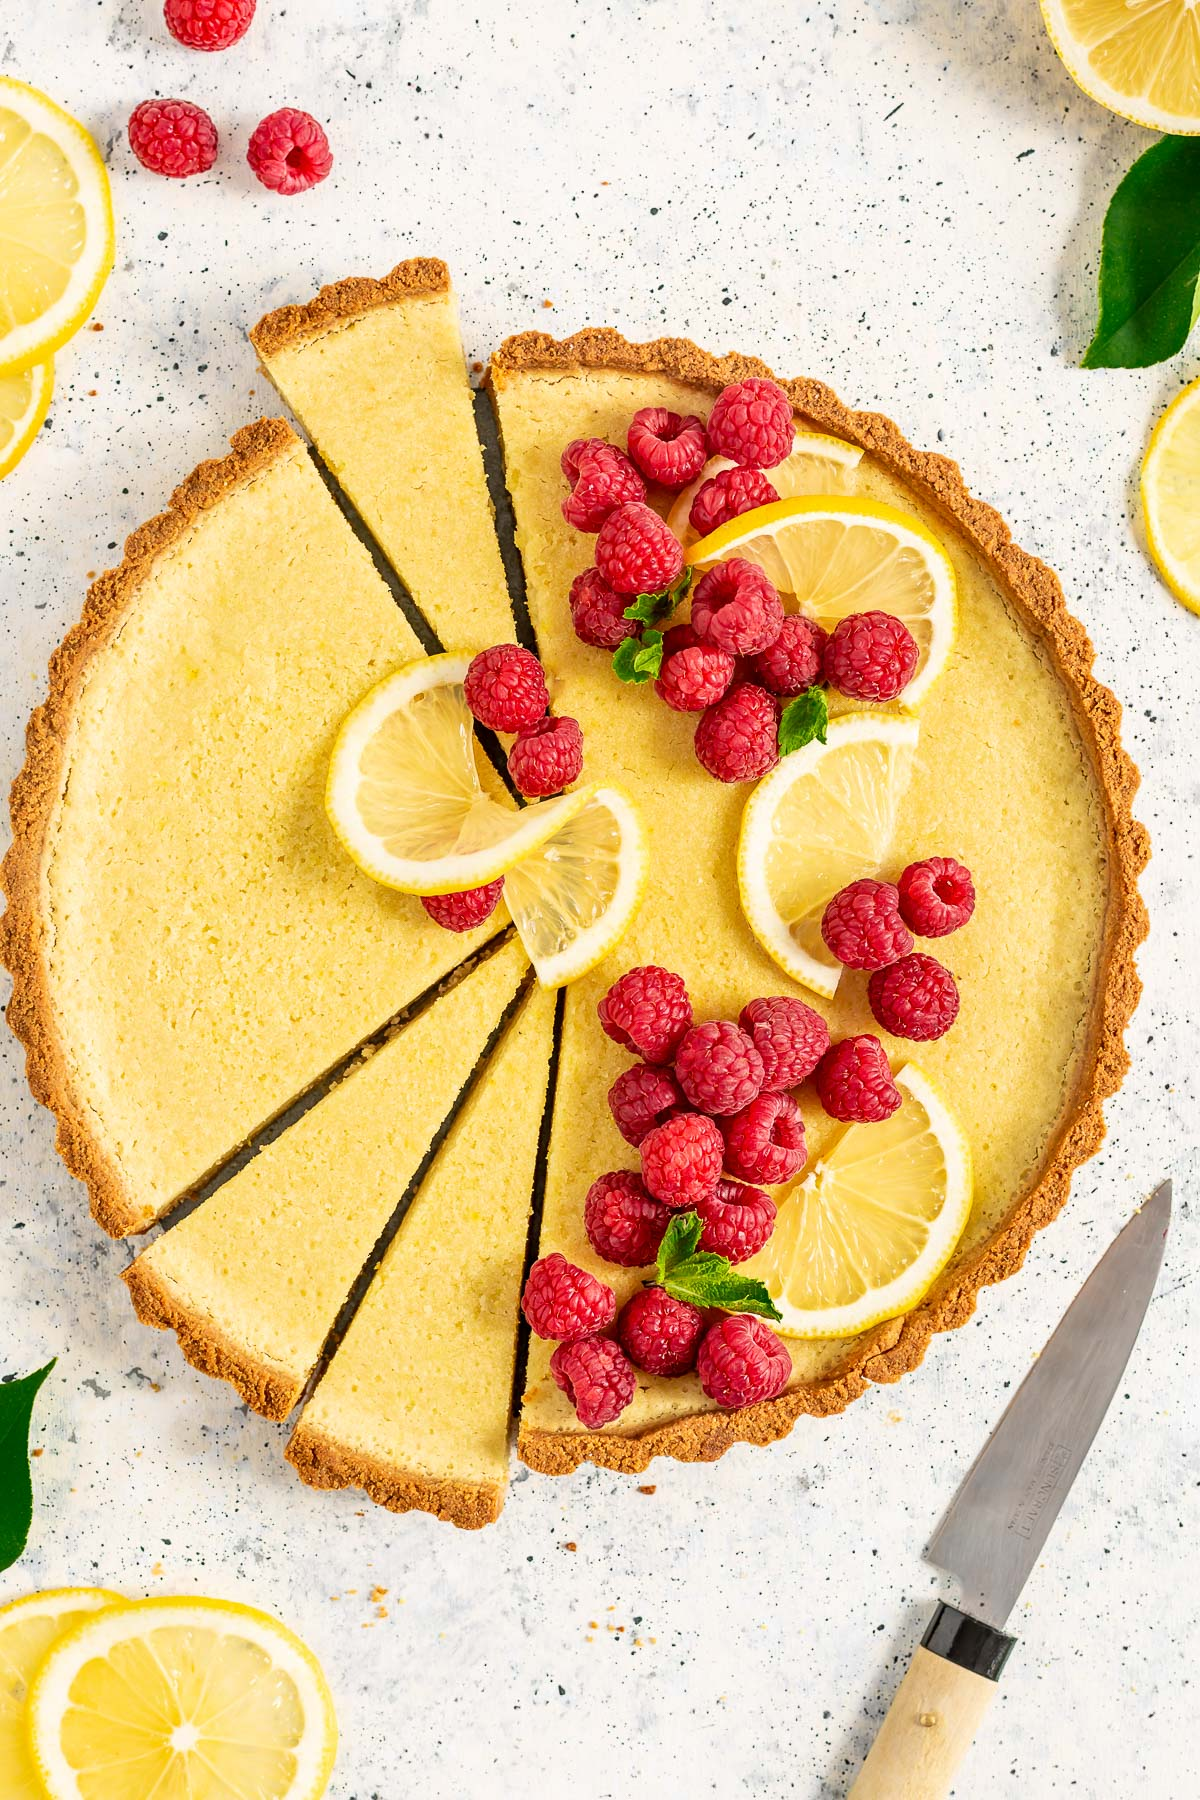 healthy Gluten-Free Vegan Lemon Tart with Almond Crust Refined Sugar-Free CROSTATA al LIMONE VEGAN con pasta FROLLA ALLE MANDORLE senza glutine